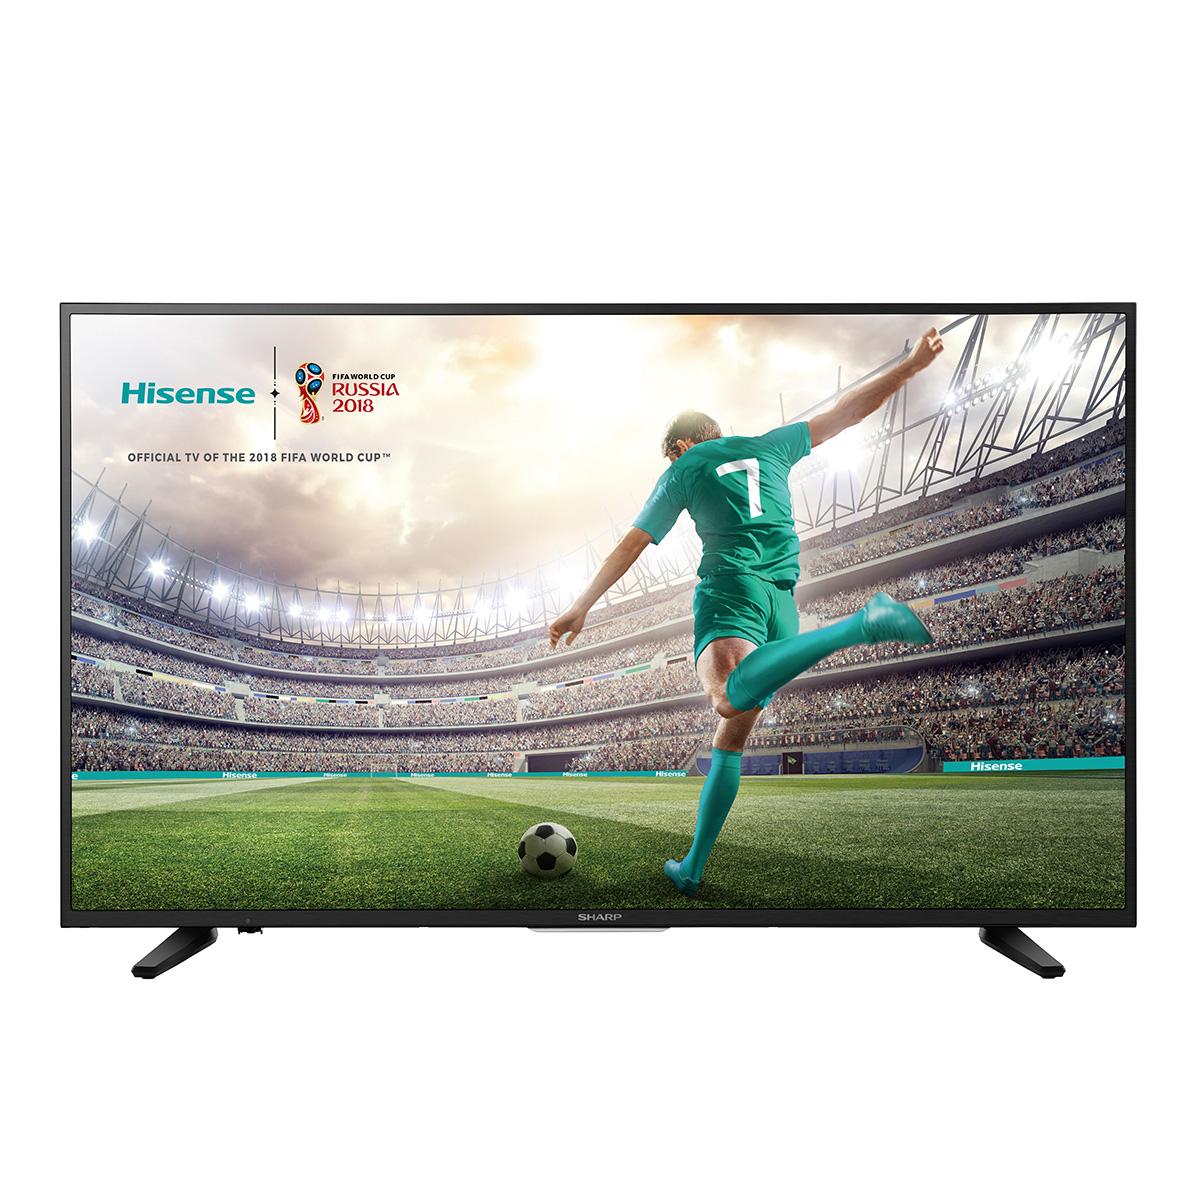 "Costco: Pantalla Sharp 55"" 4K HDR Smart TV LC-55Q7000U"